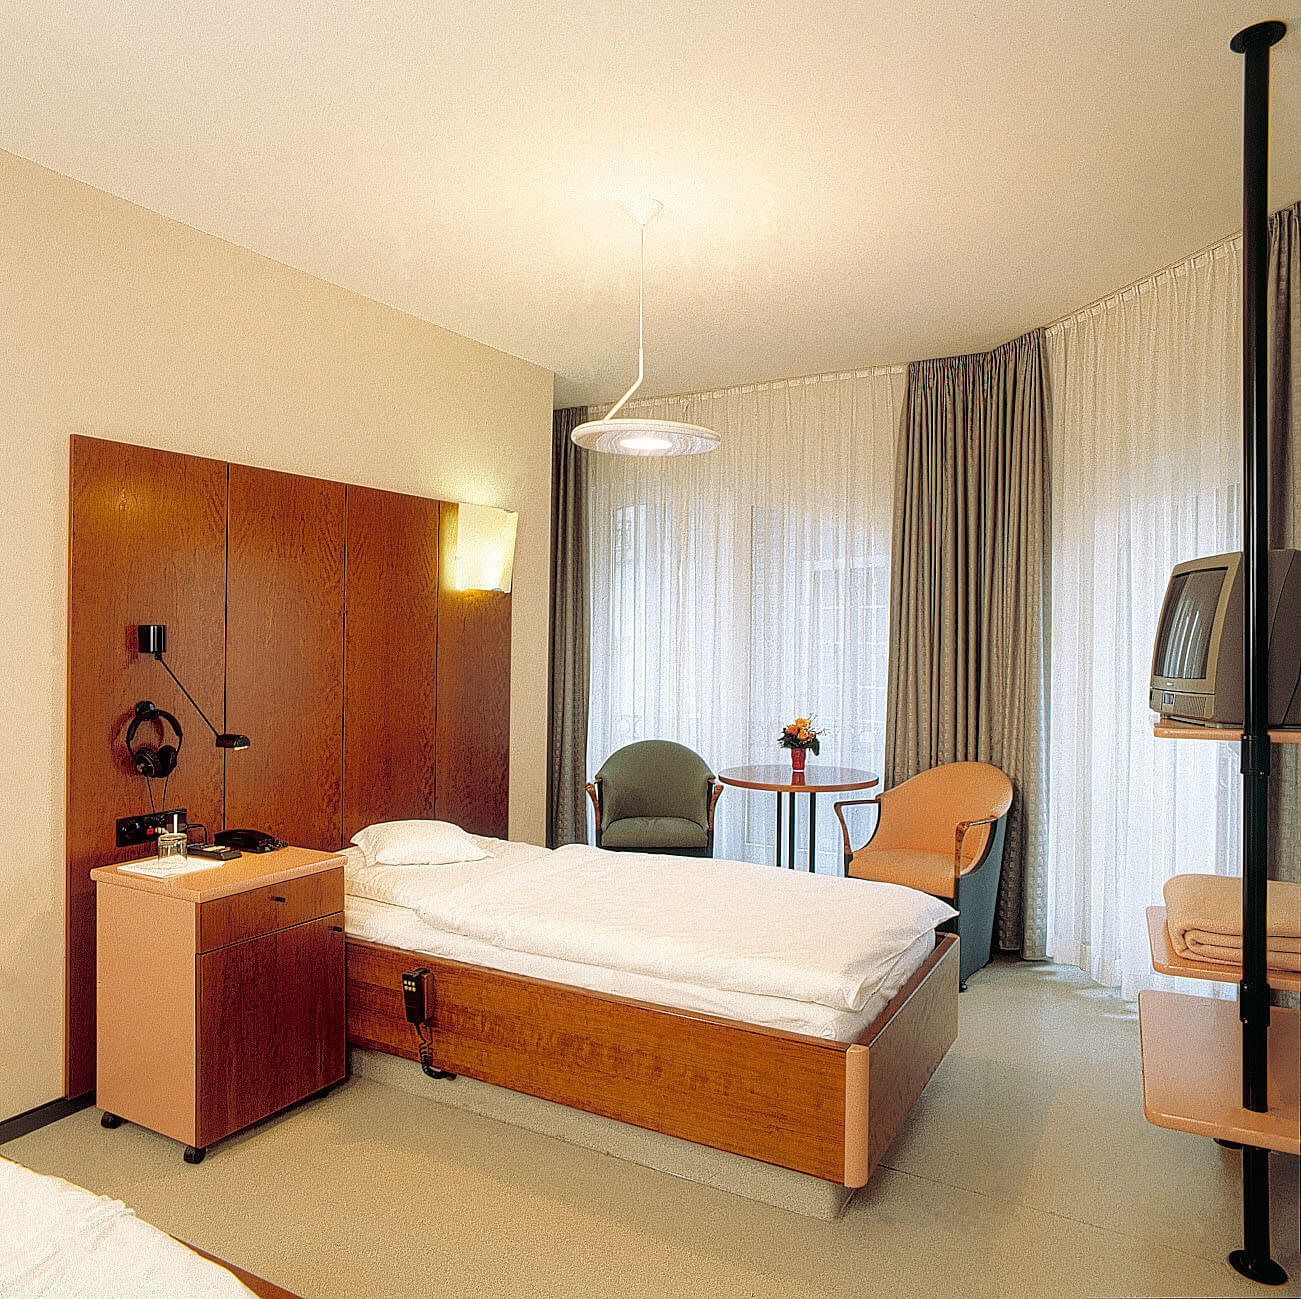 dr helge m jens plastische und sthetische chirurgie in aachen. Black Bedroom Furniture Sets. Home Design Ideas